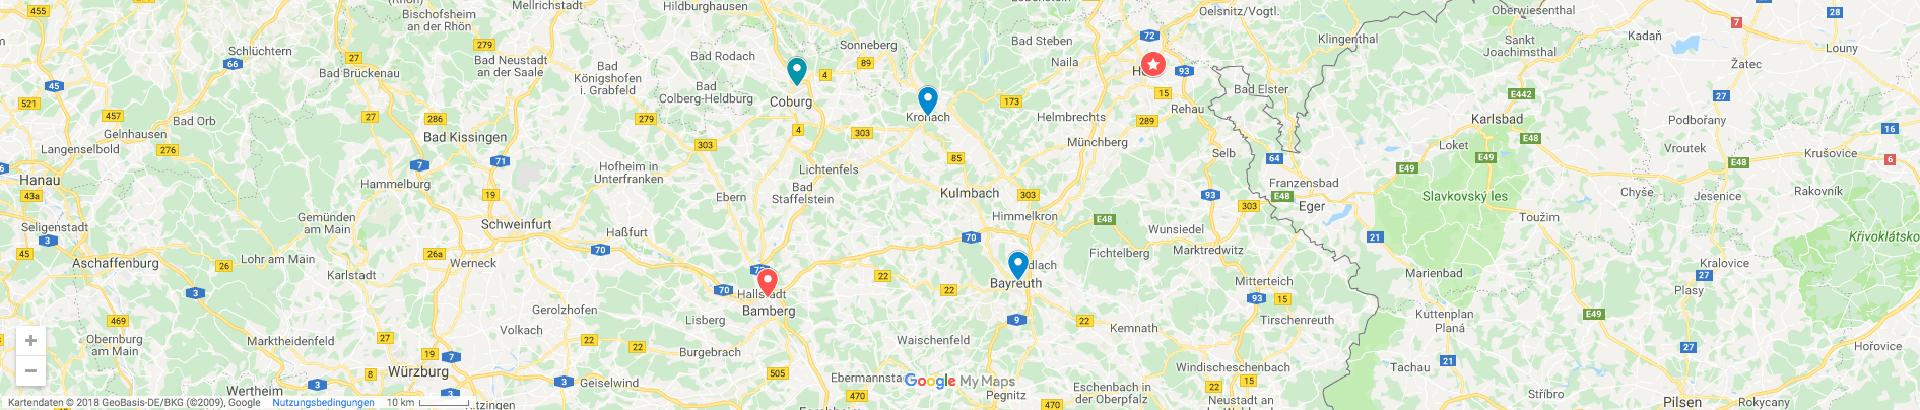 Google Map der digitalen Gründerzentren in Oberfranken